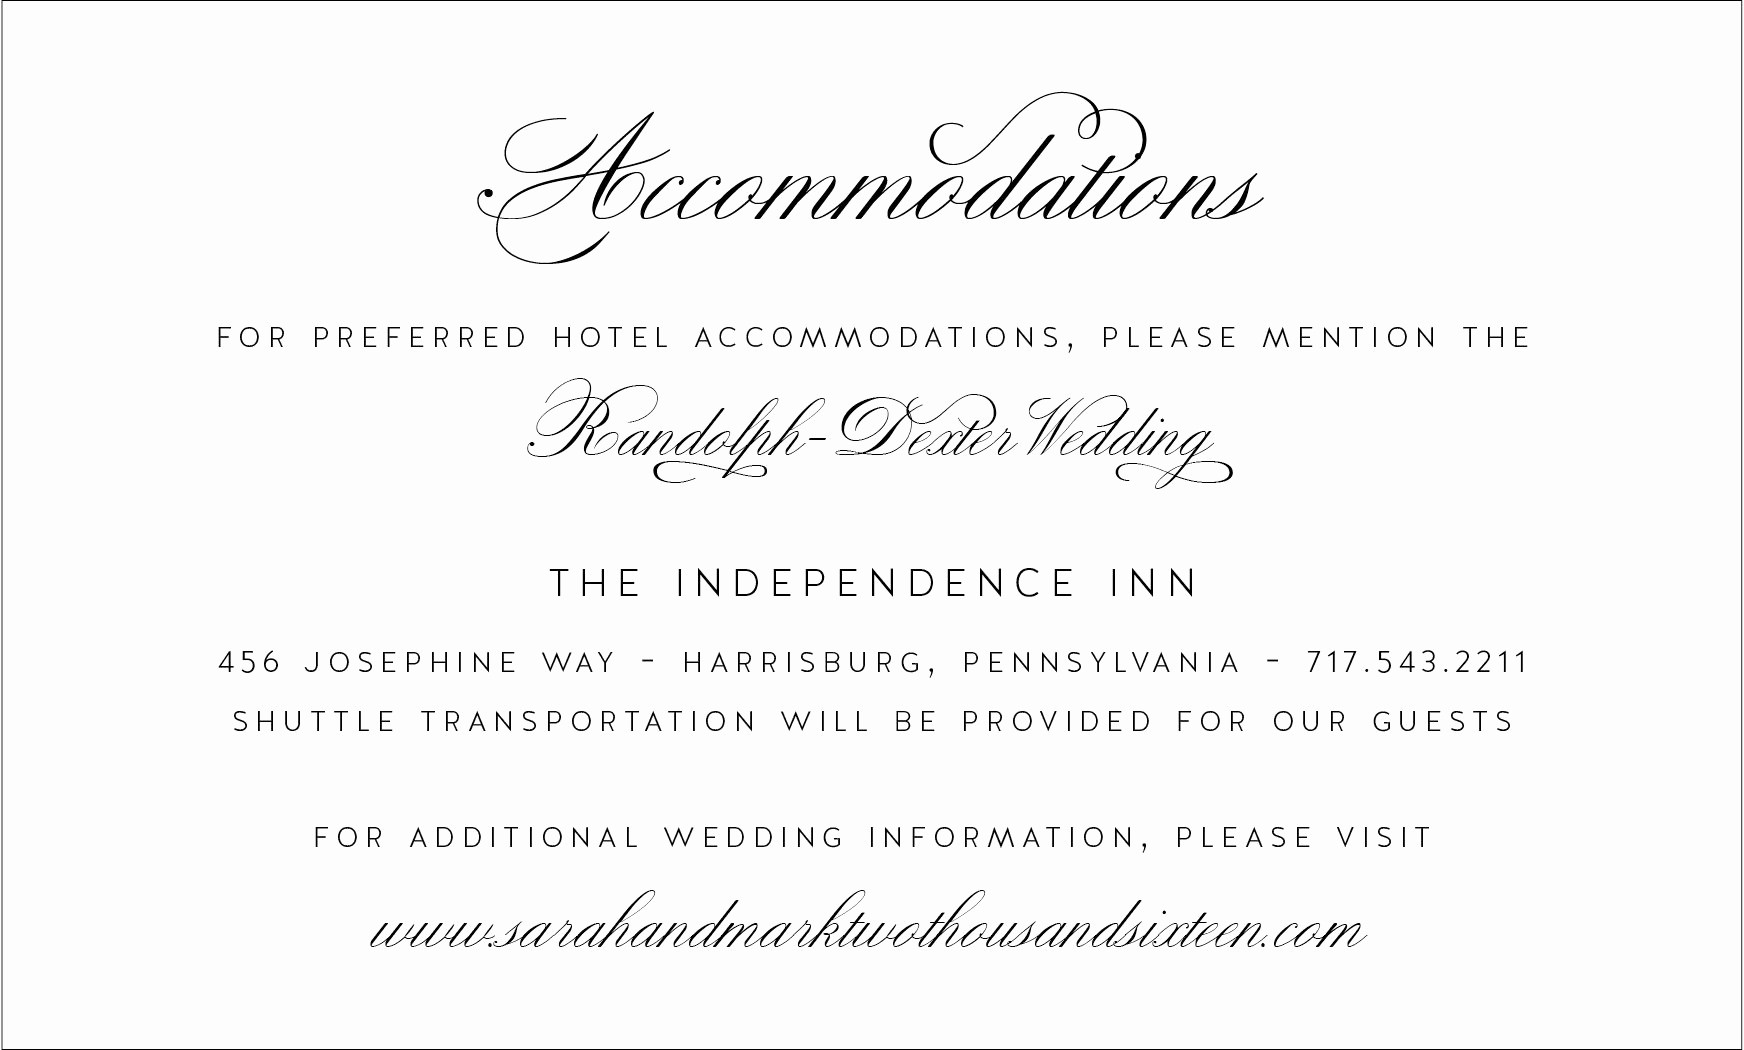 Free Wedding Accommodation Card Template Lovely Wedding Invitation Directions Card Wedding Reception